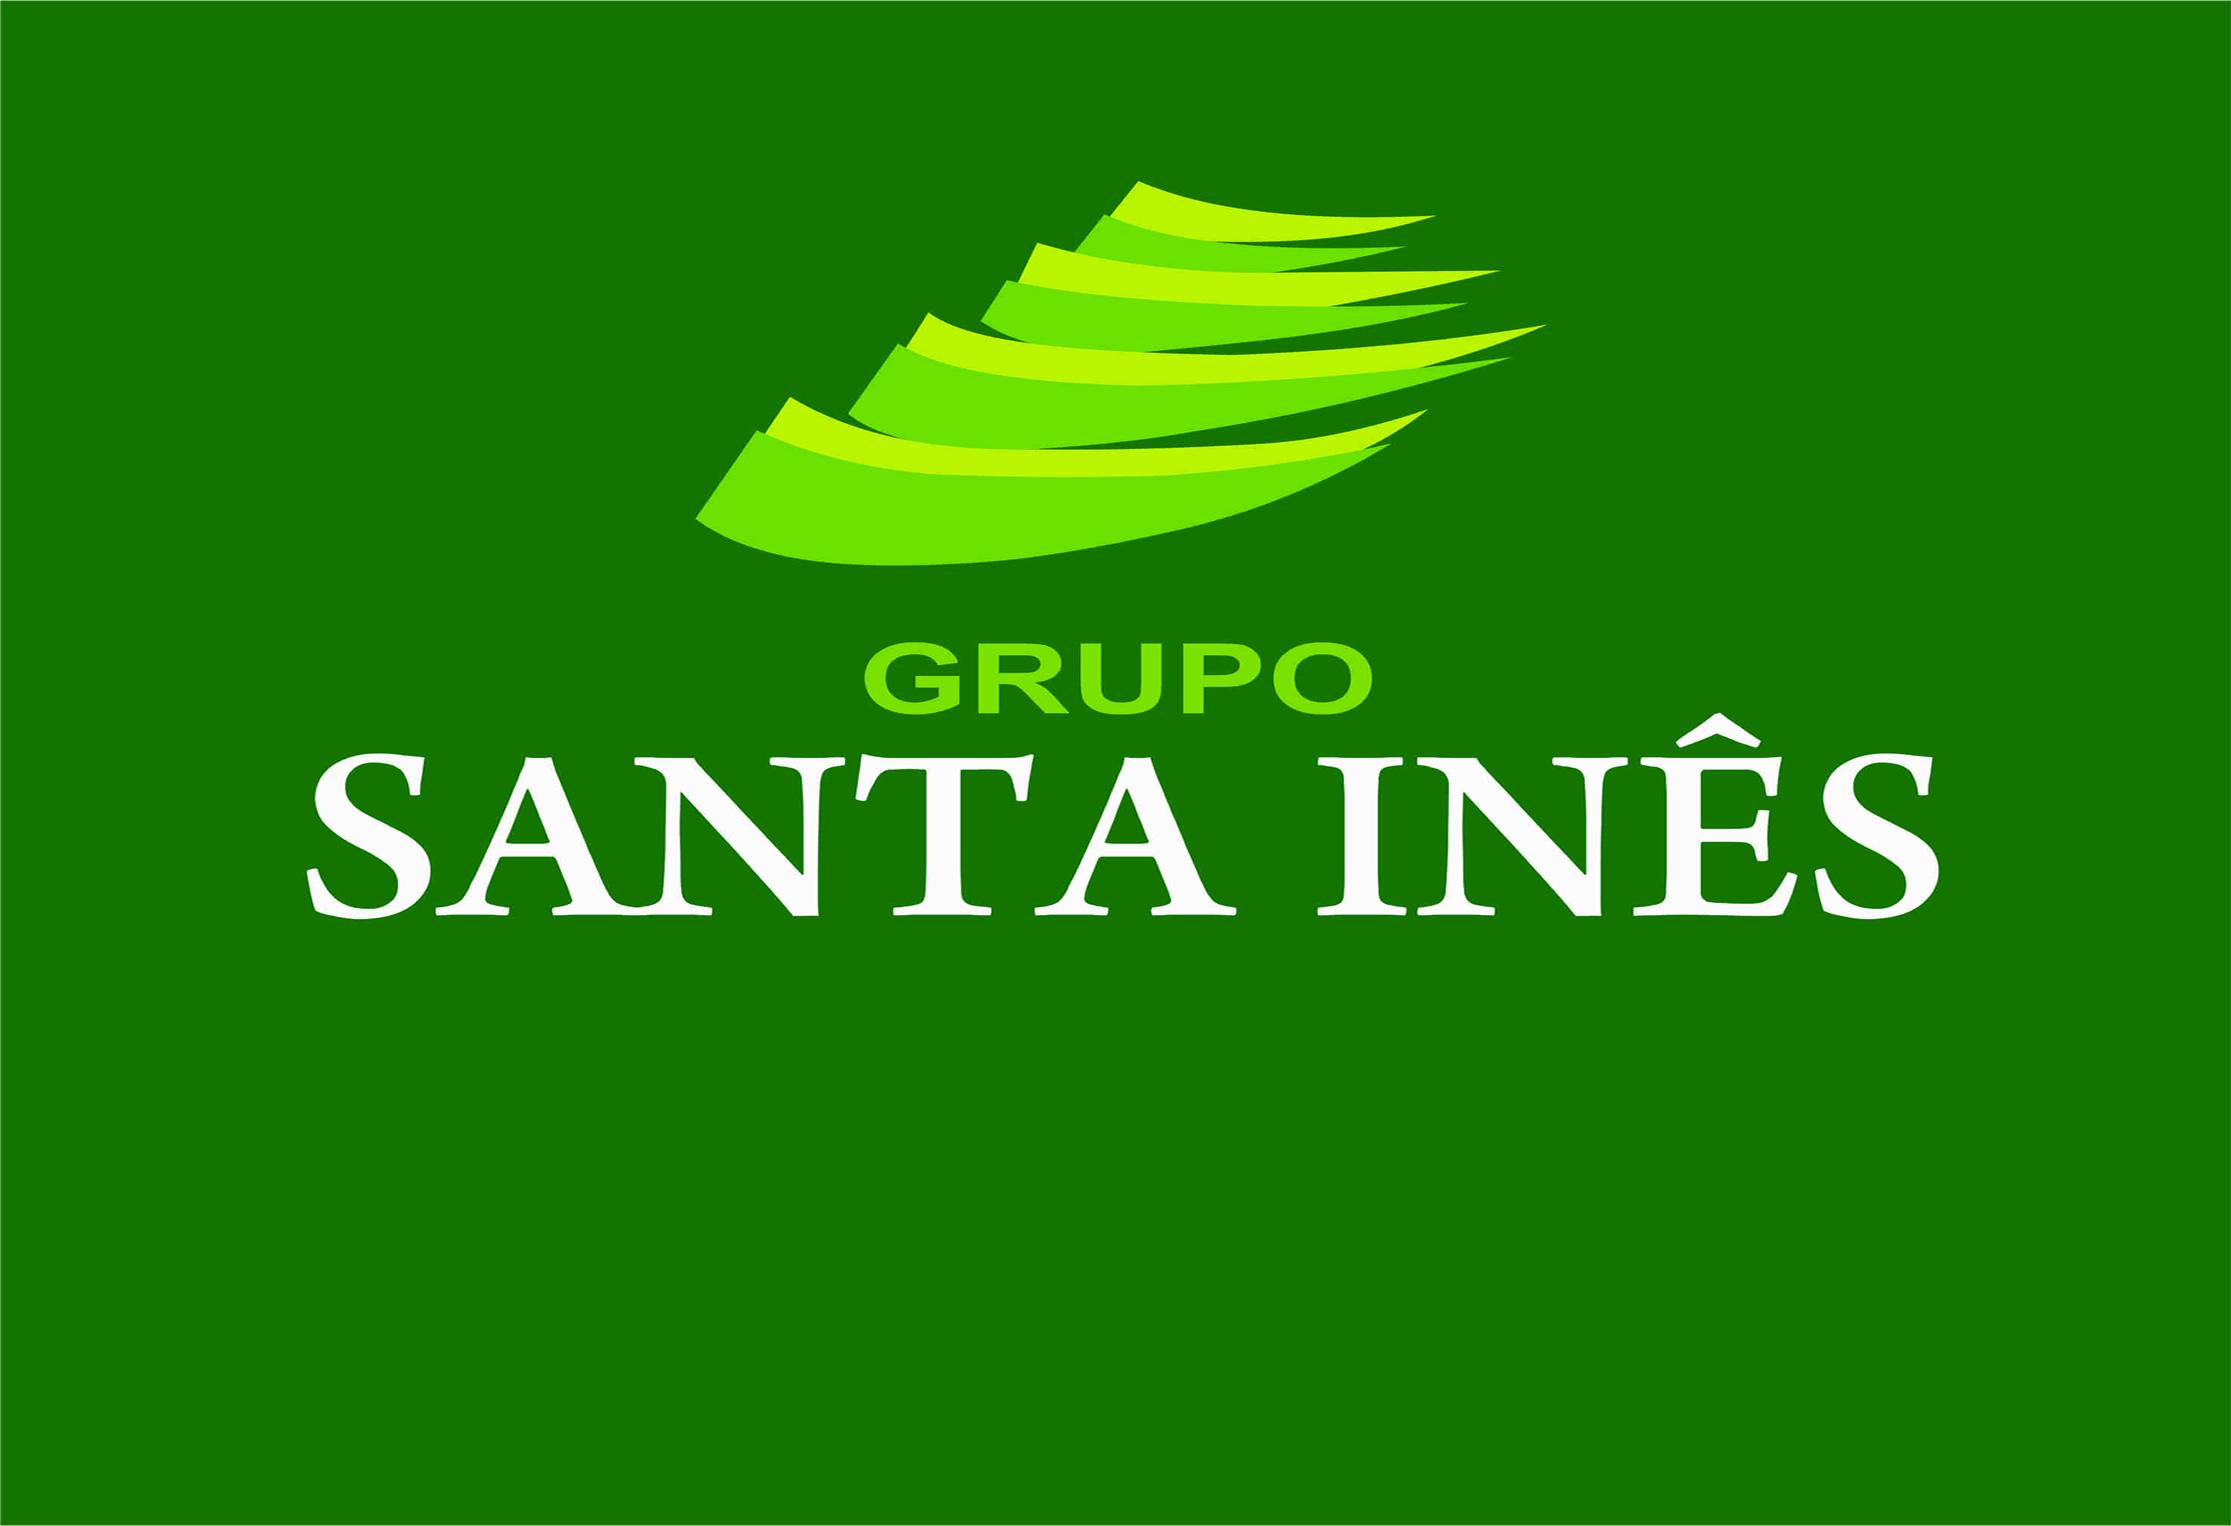 Grupo Santa Inês